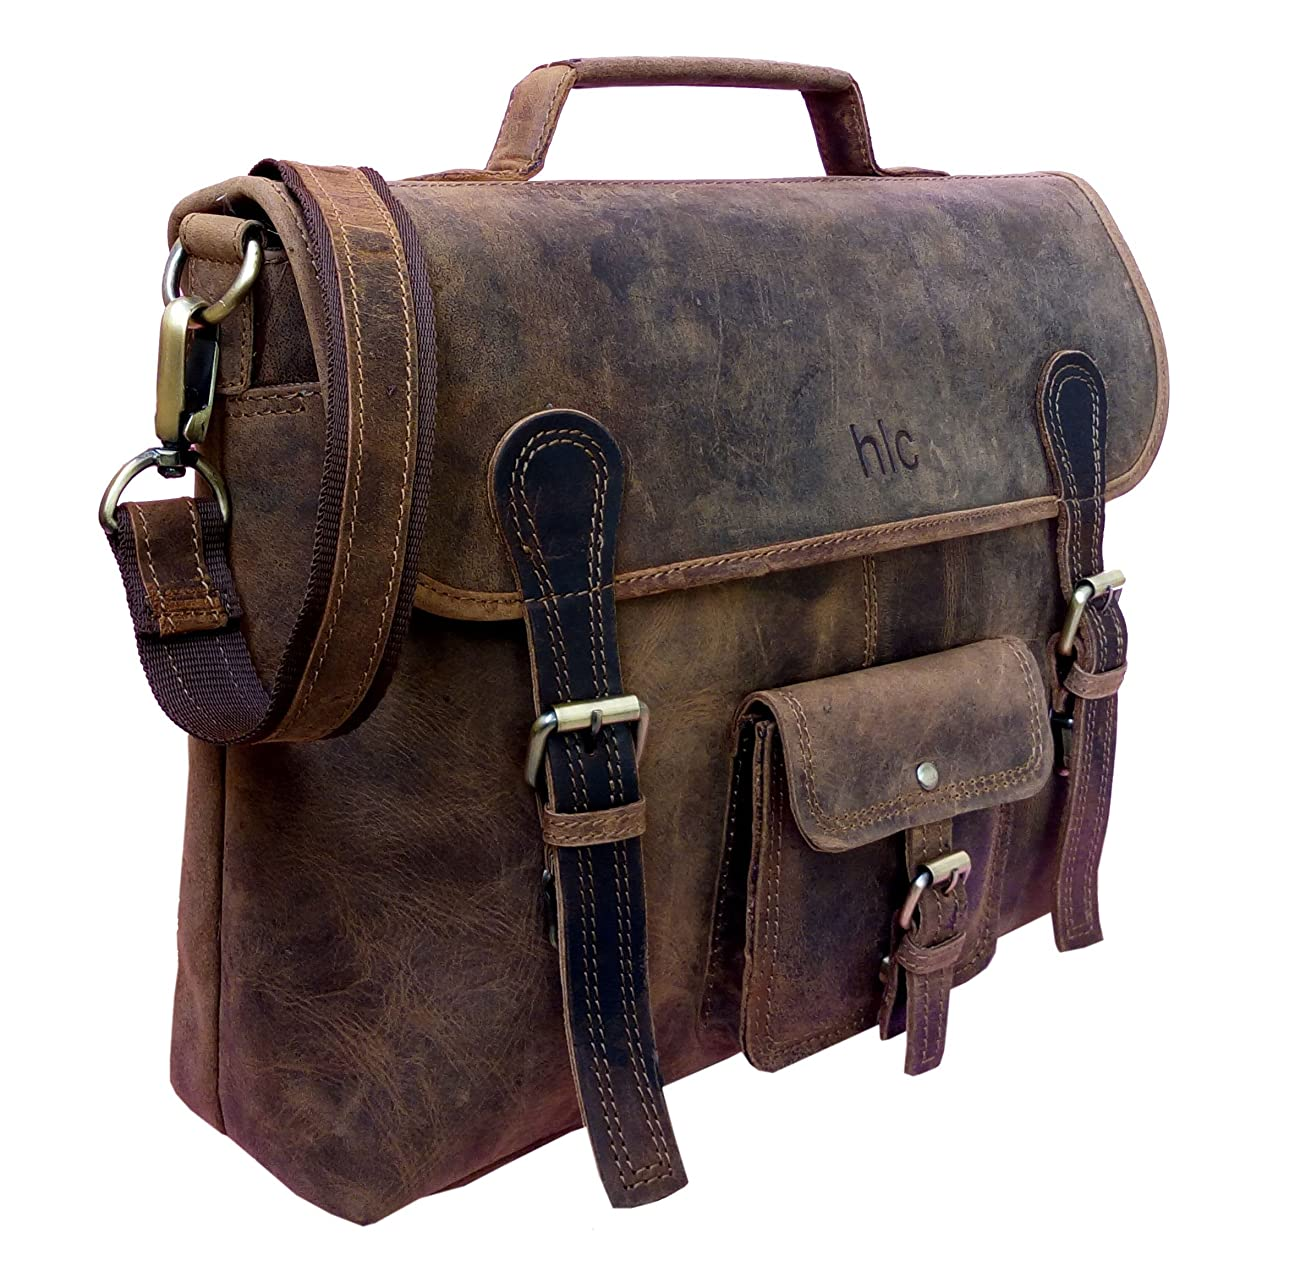 Handolederco. Vintage Leather Laptop Bag 15